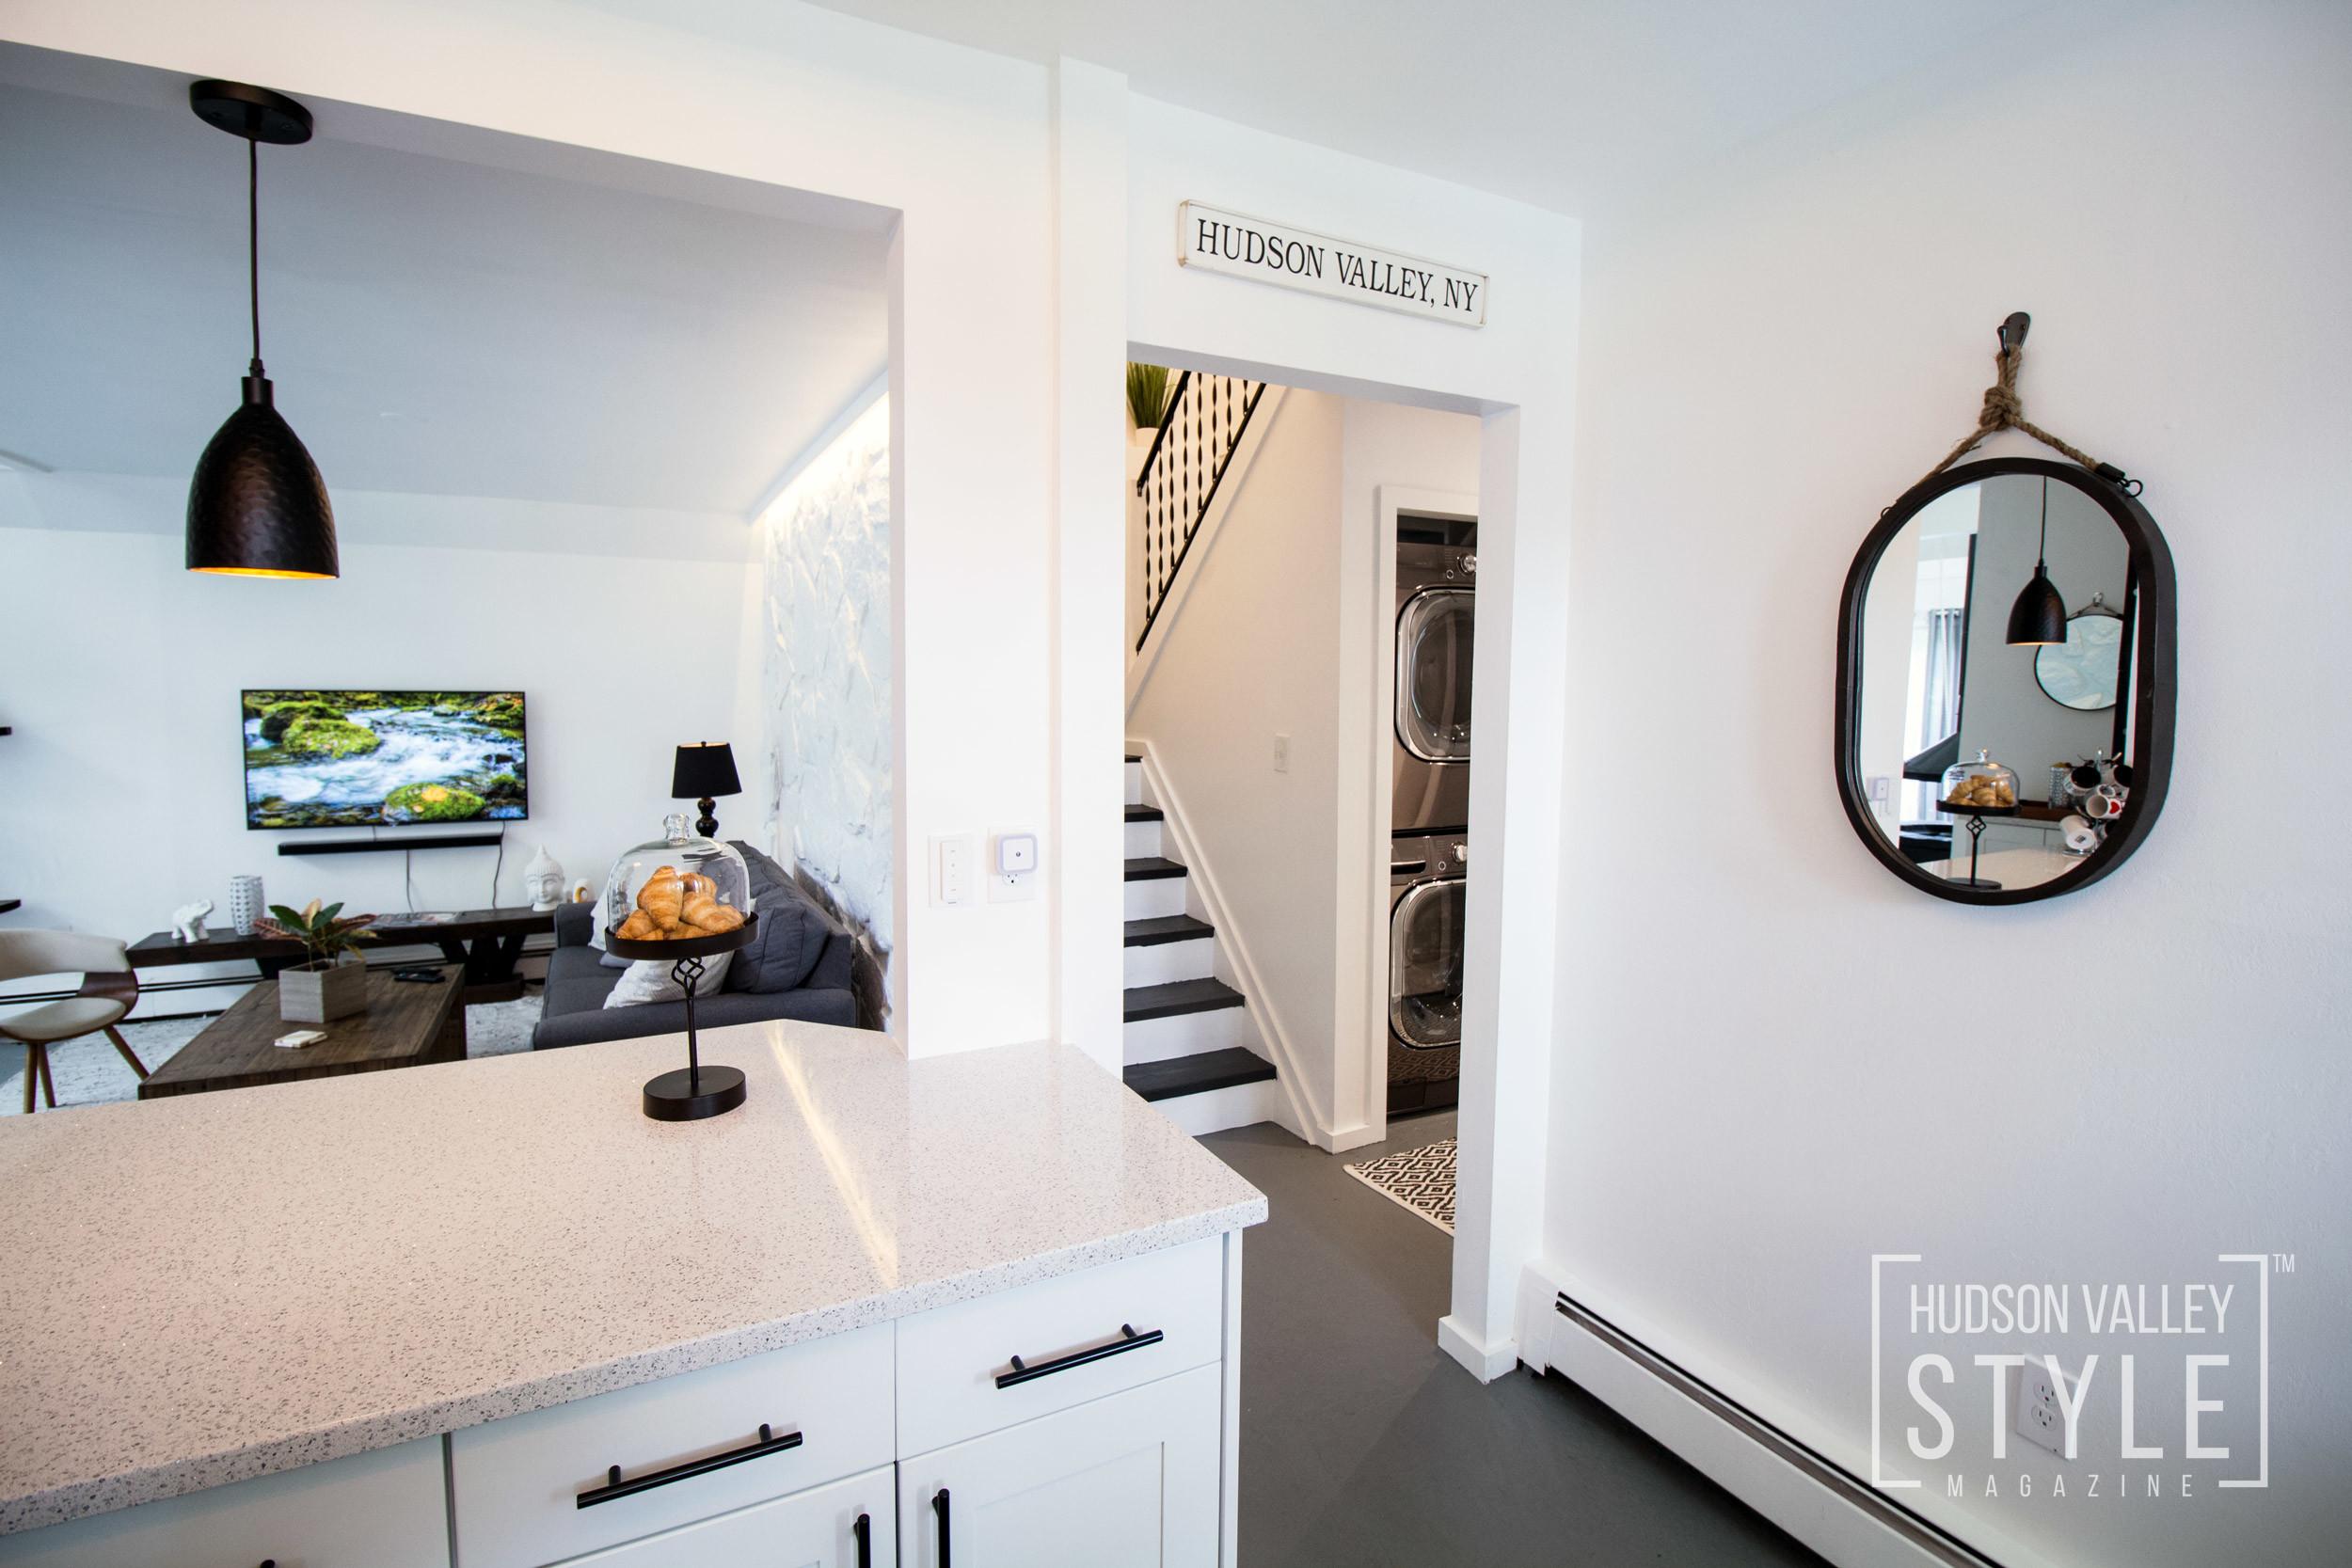 Almax Realty: Luxury Hudson Valley Villa for Sale